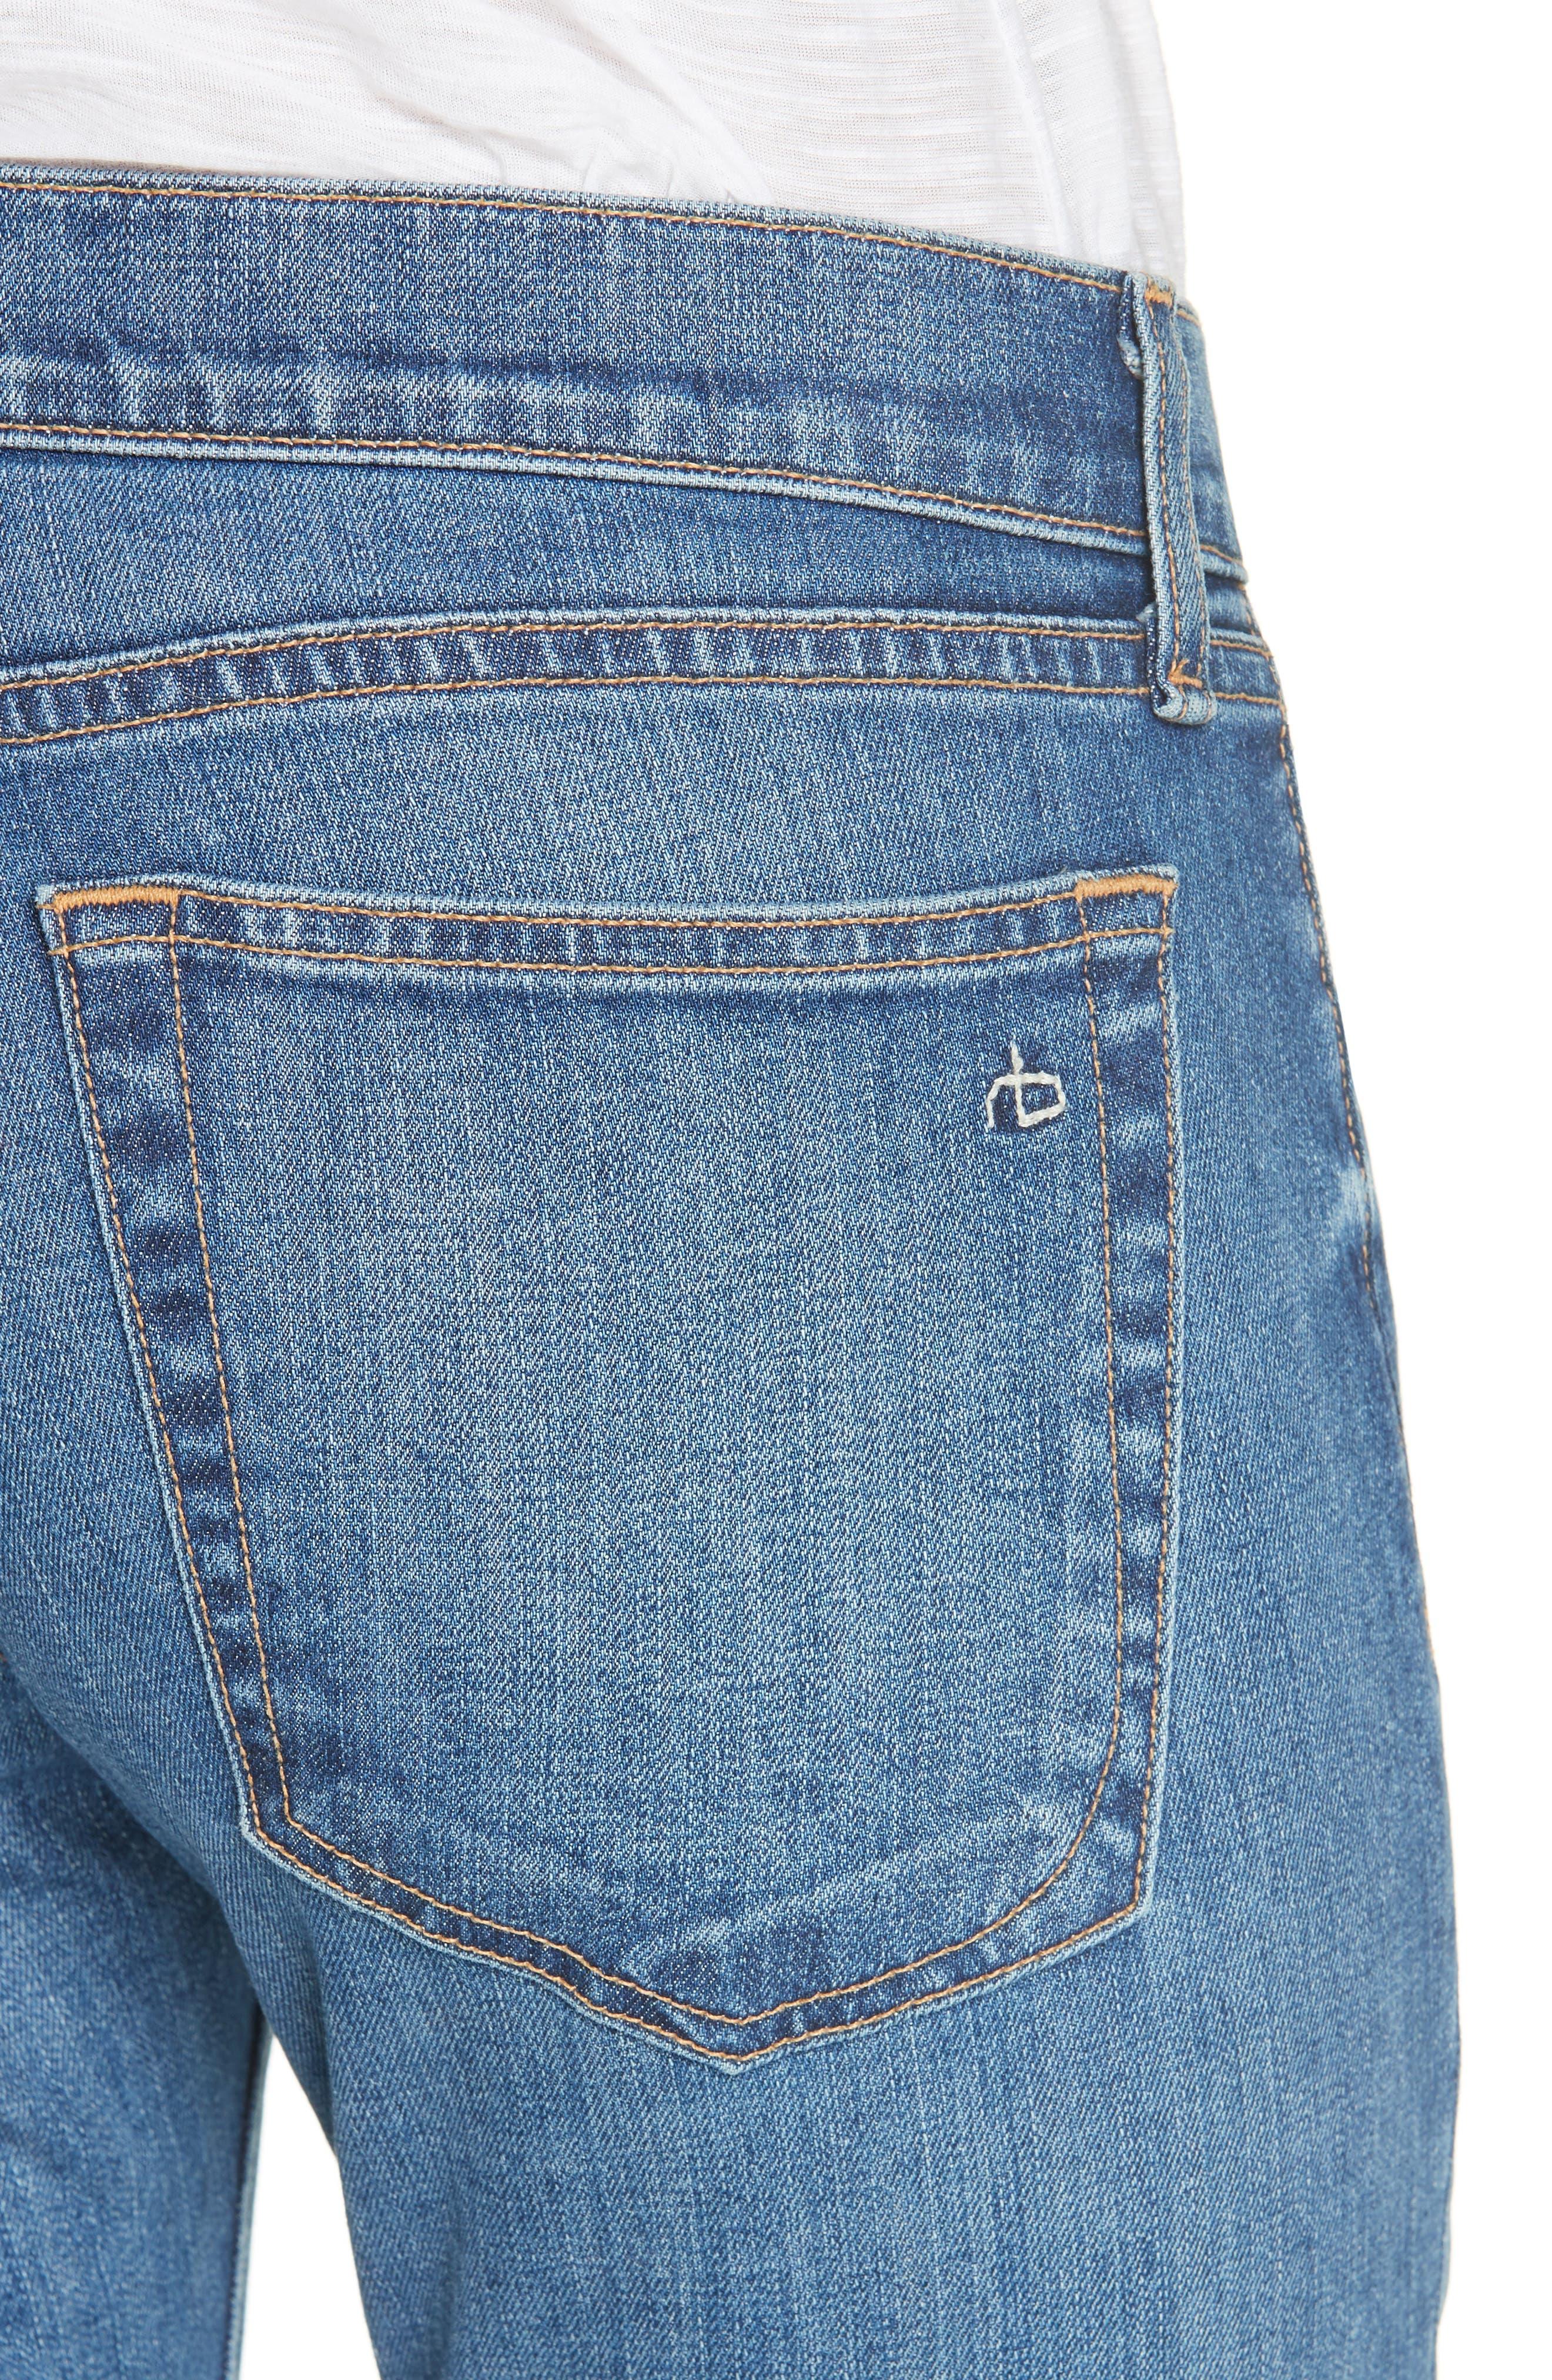 RAG & BONE, Dre Slim Fit Boyfriend Jeans, Alternate thumbnail 5, color, EL